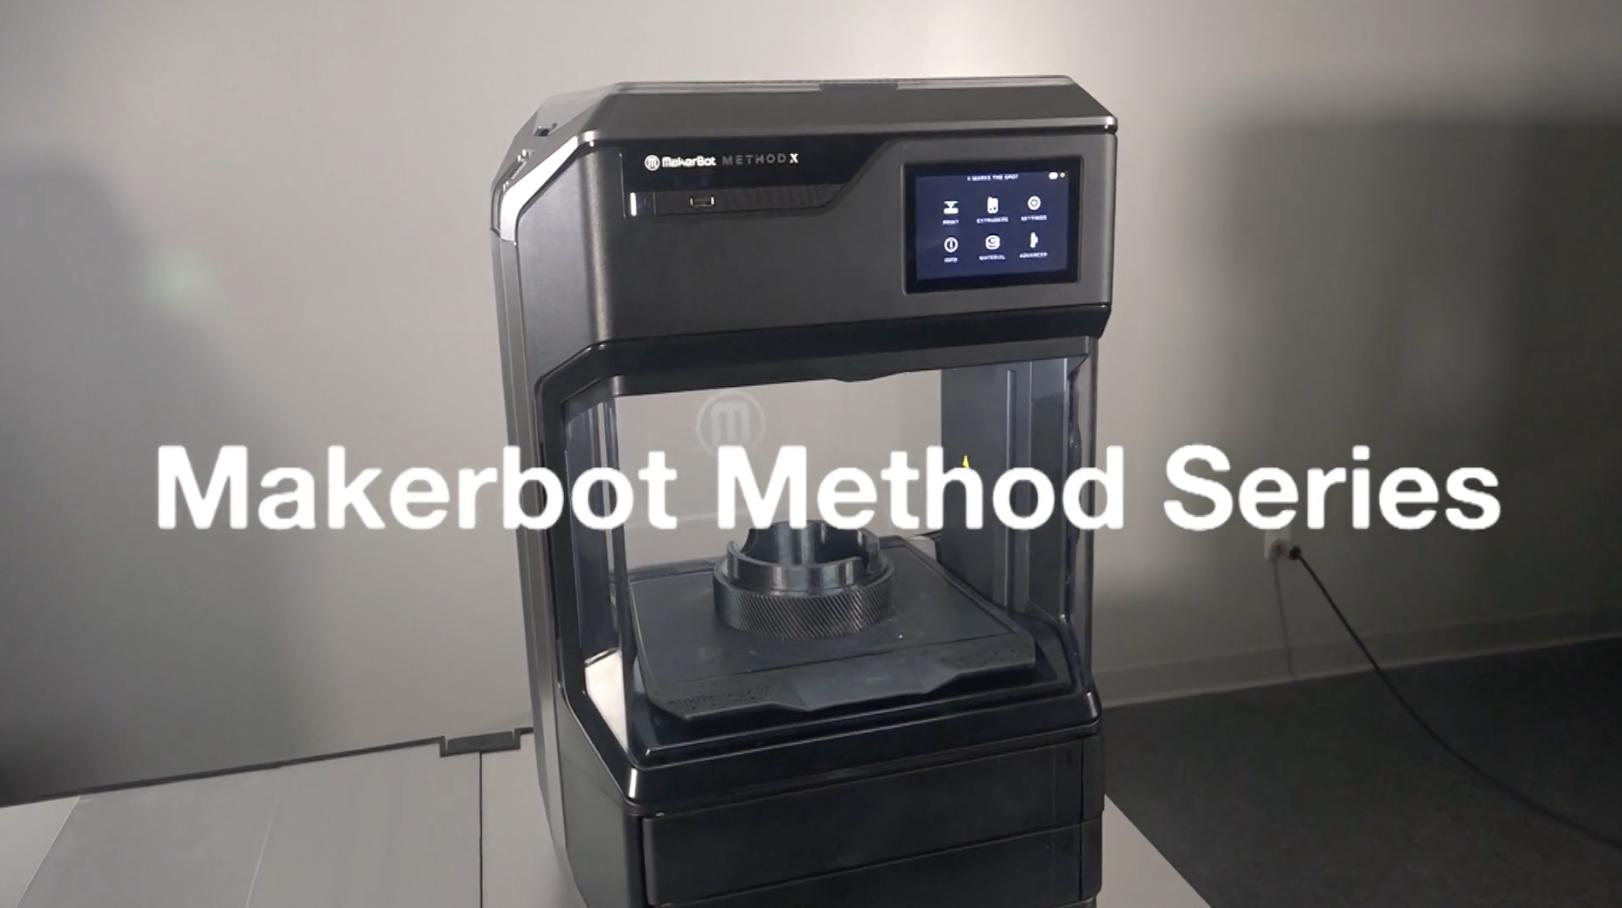 Exploring the MakerBot Method 3D Printer